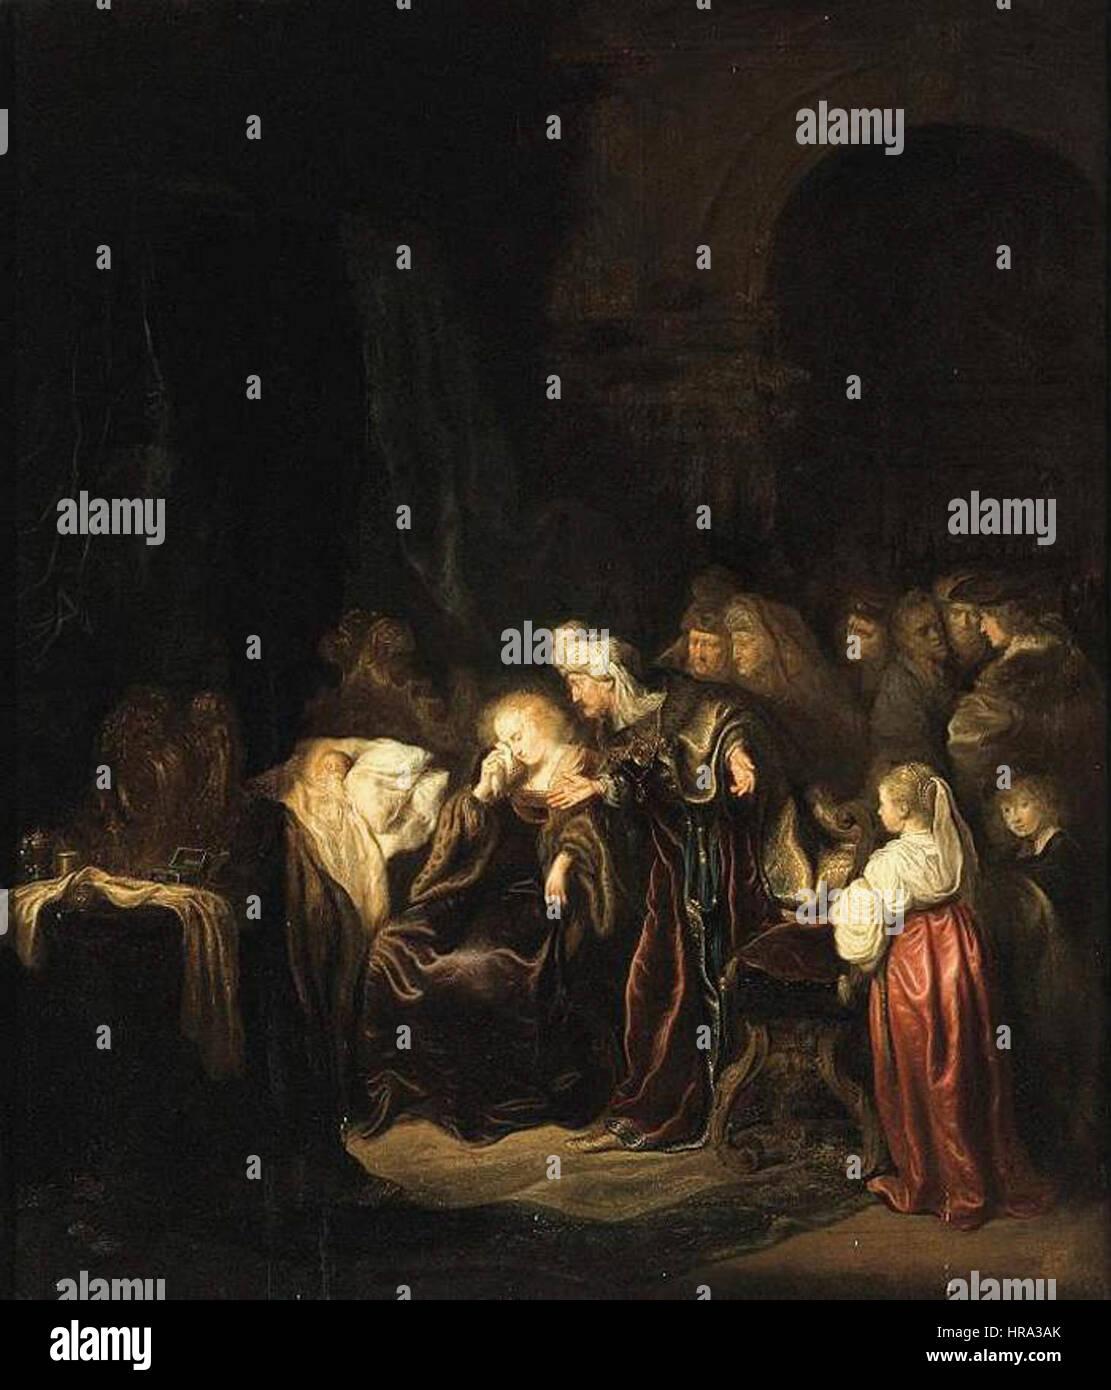 b8b1367bc6fe Salomon Koninck - David and Batsheba Mourning over Their Dead Son -  WGA12248 - Stock Image